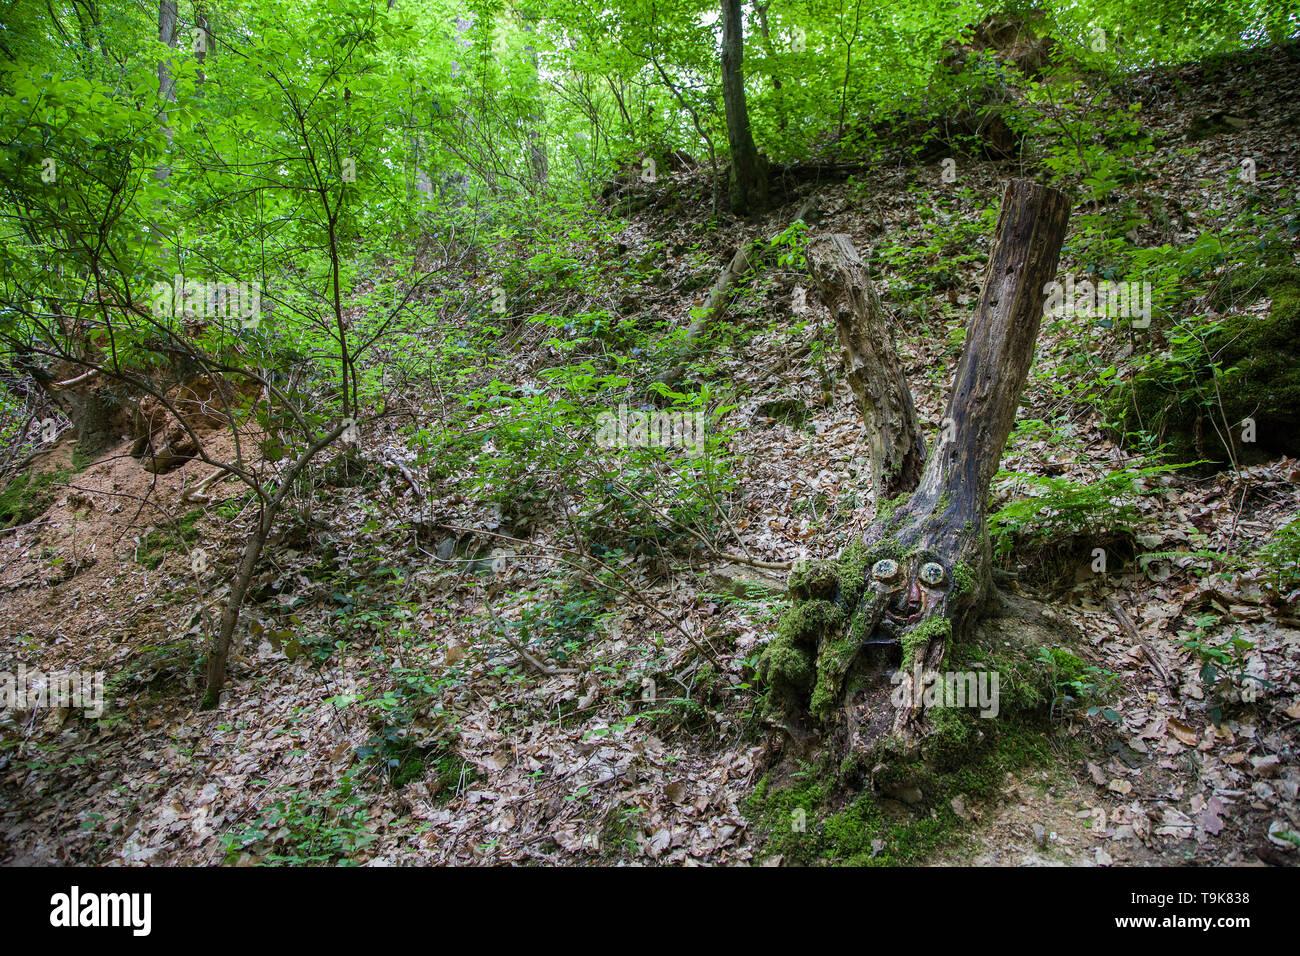 Carved face in a tree stump, Steckeschlääfer-Klamm, Binger forest, Bingen on the Rhine, Rhineland-Palatinate, Germany - Stock Image